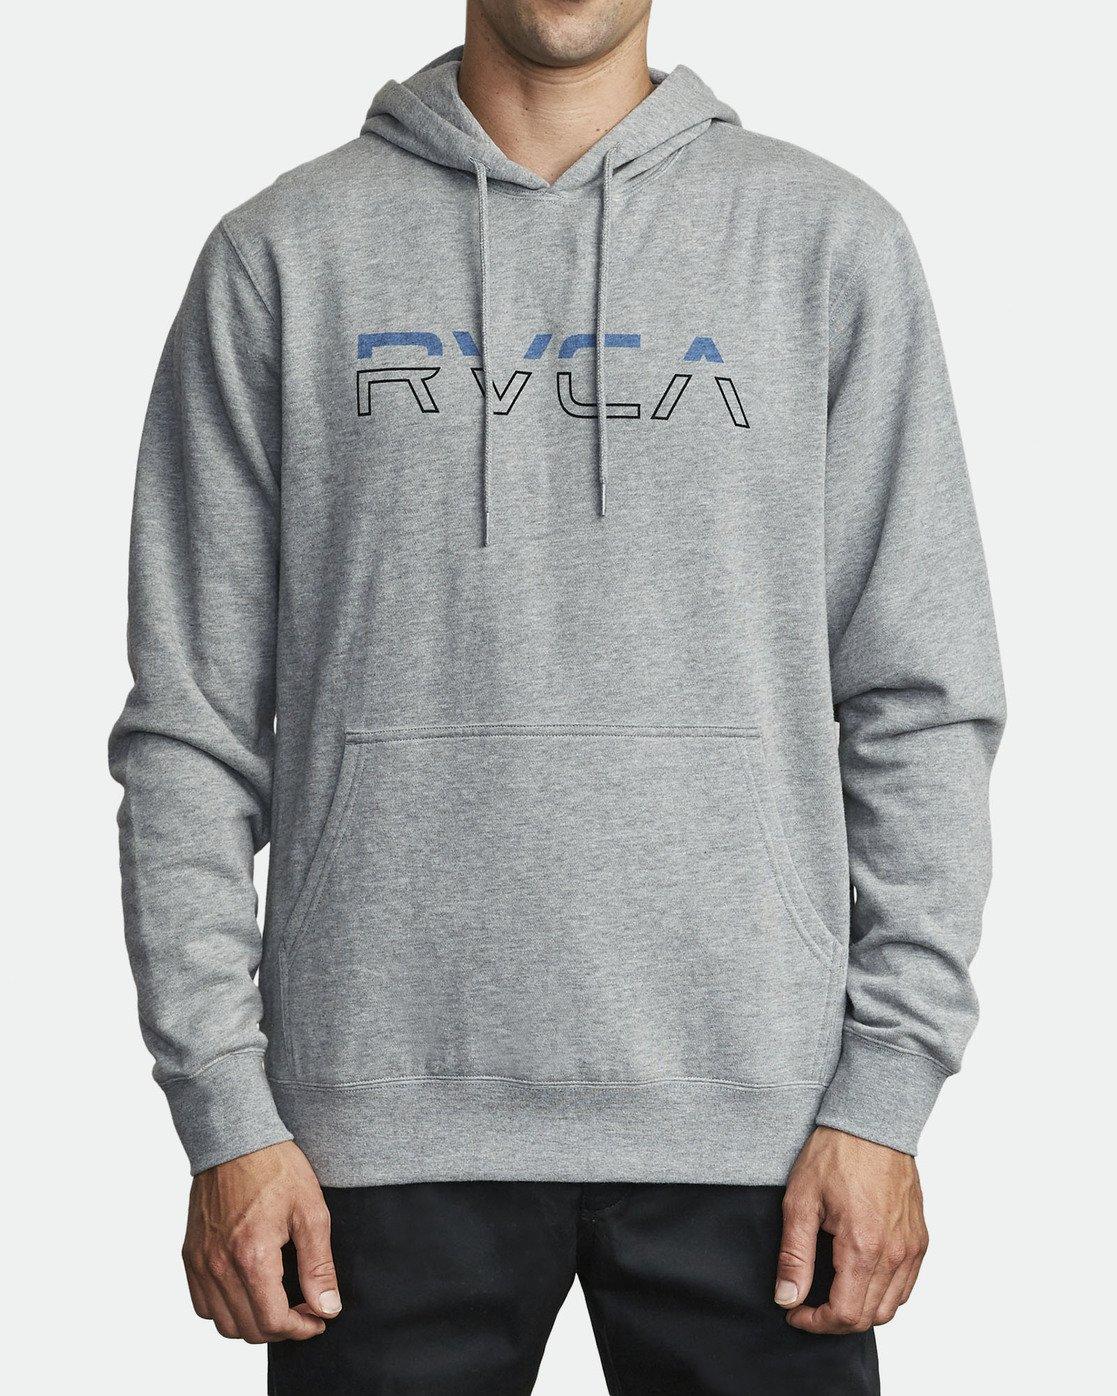 0 SPLIT PIN HOODIE Grey M6291RSP RVCA